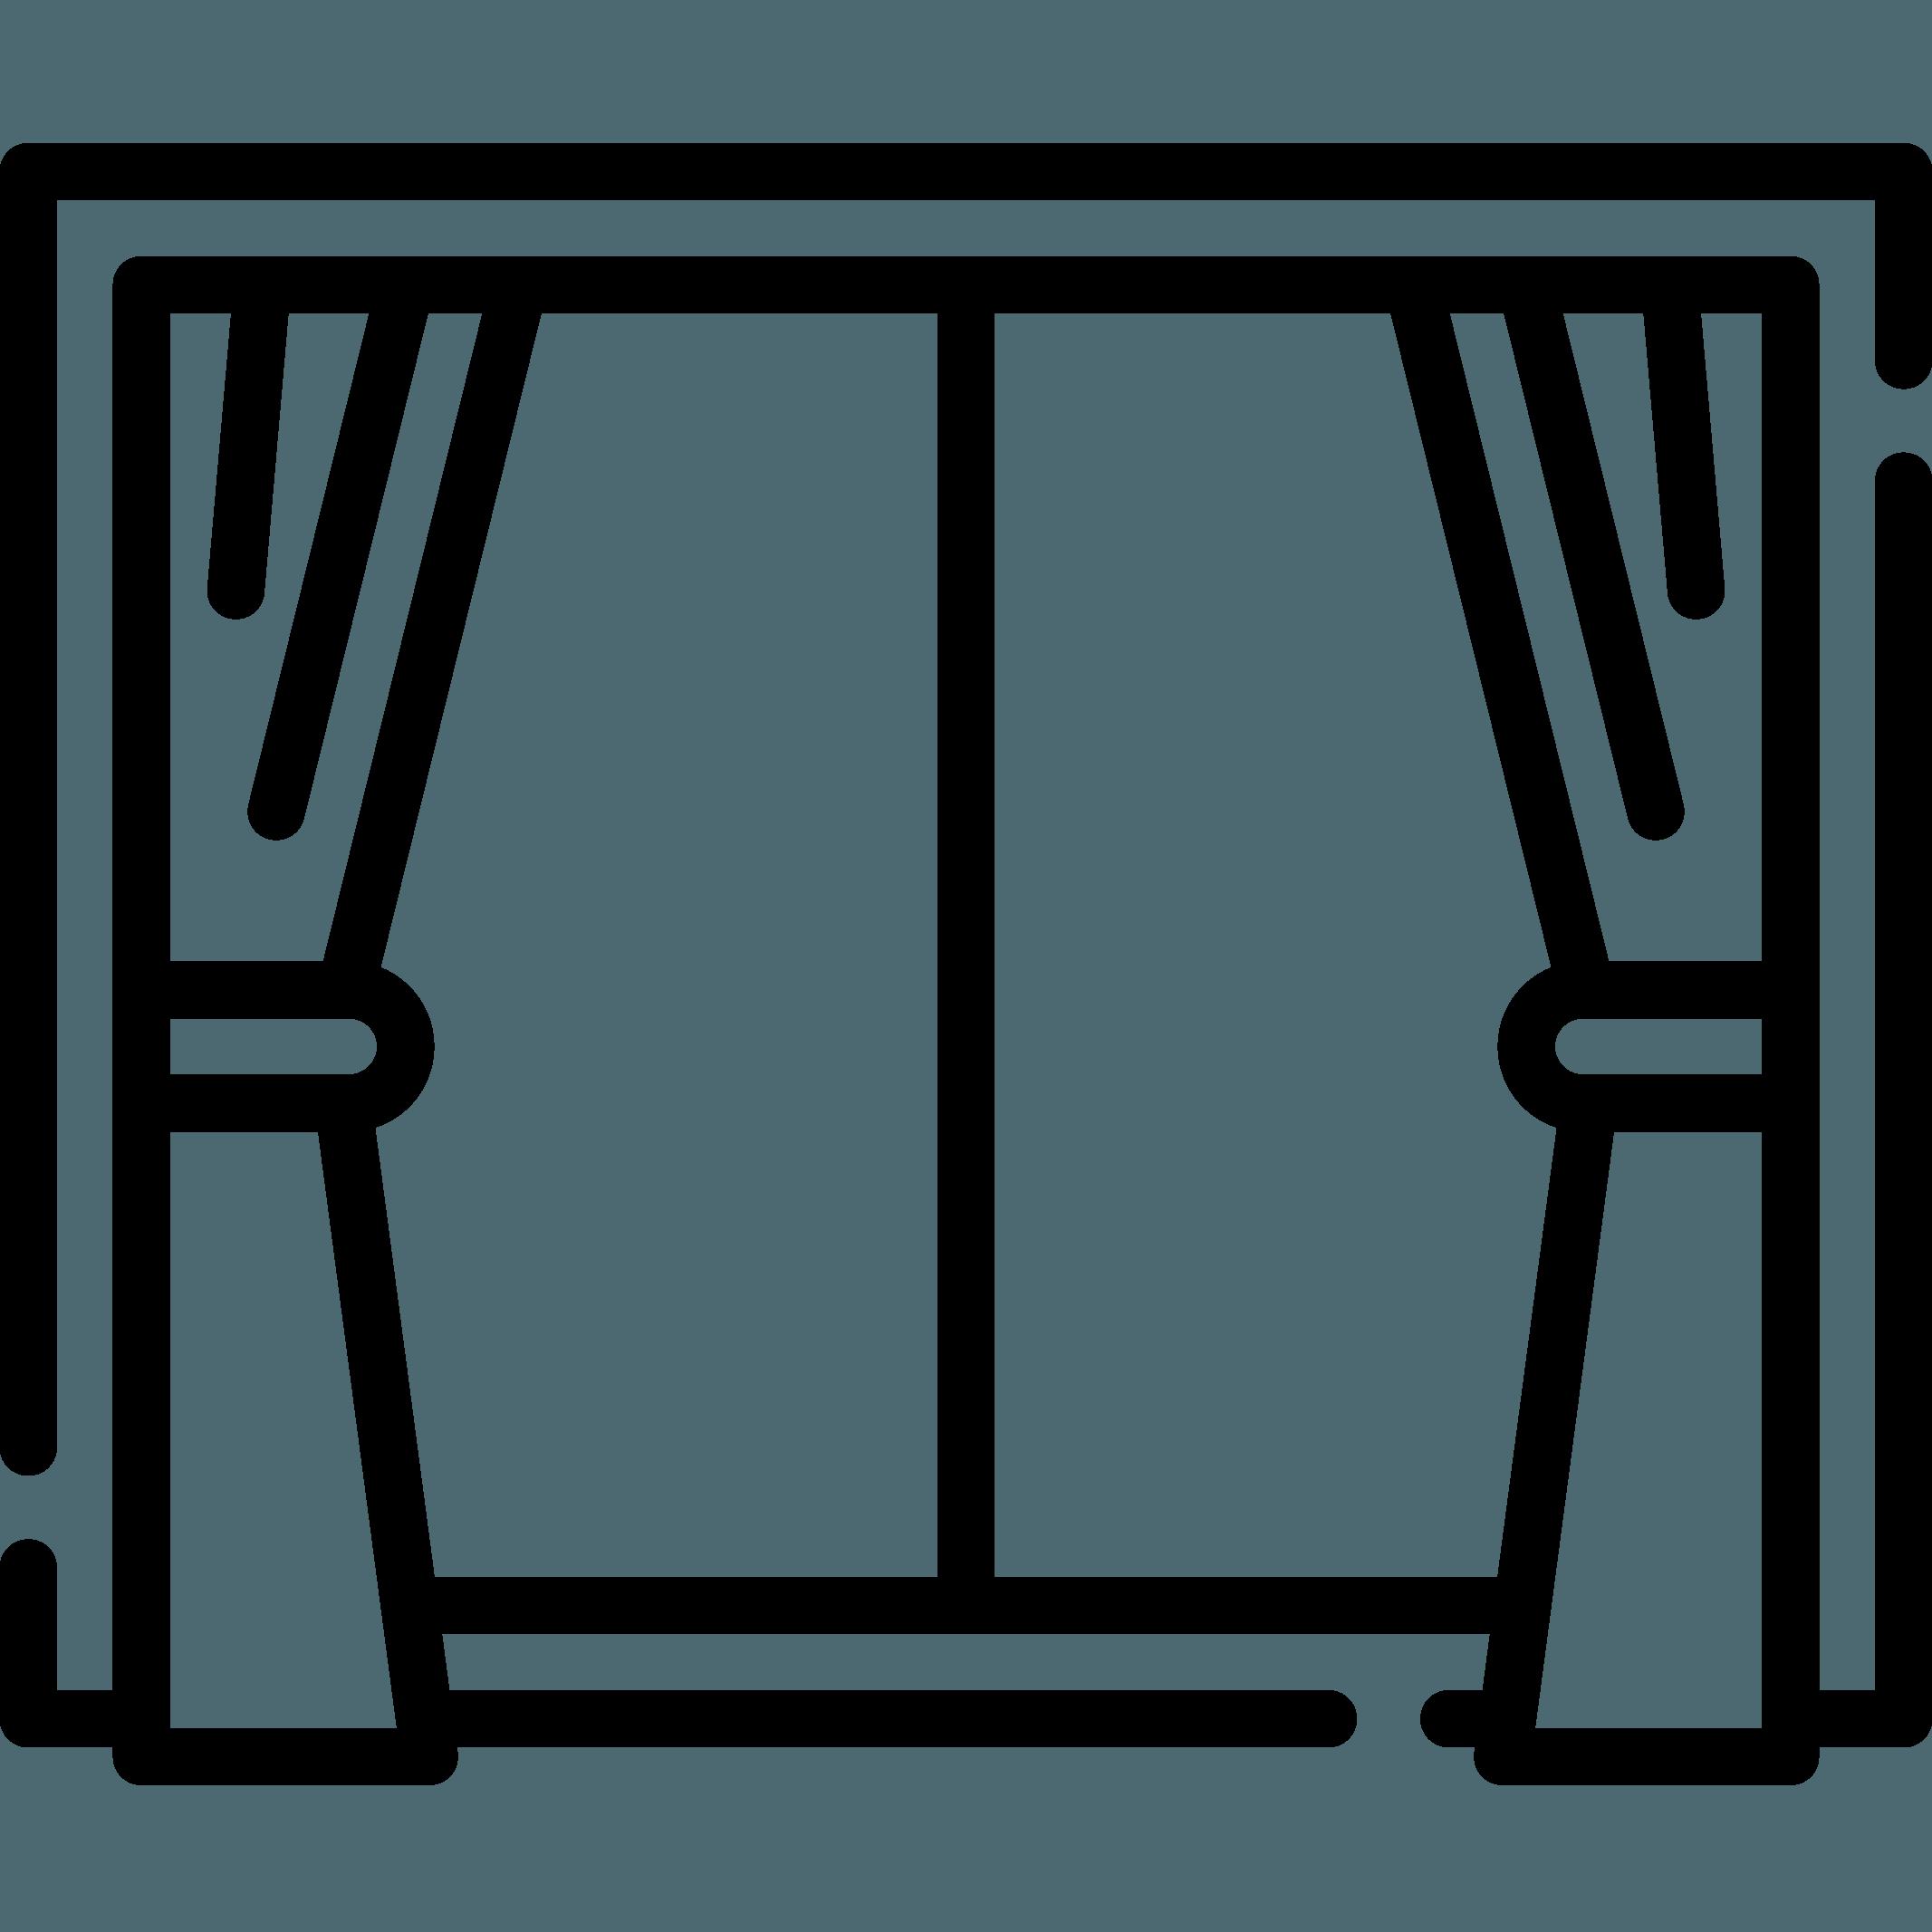 Ventanas doble vidrio